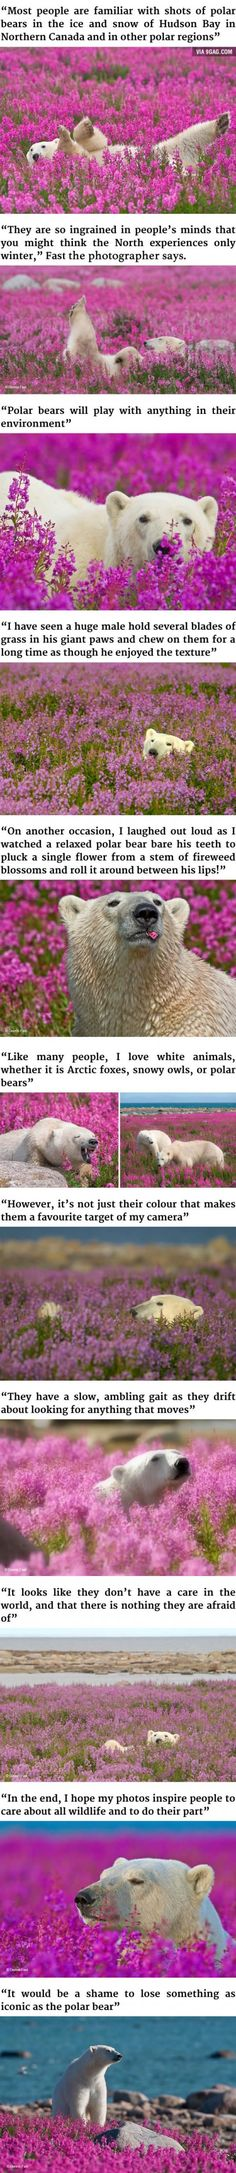 Polar Bears Playing In Flower Fields (By Dennis Fast)